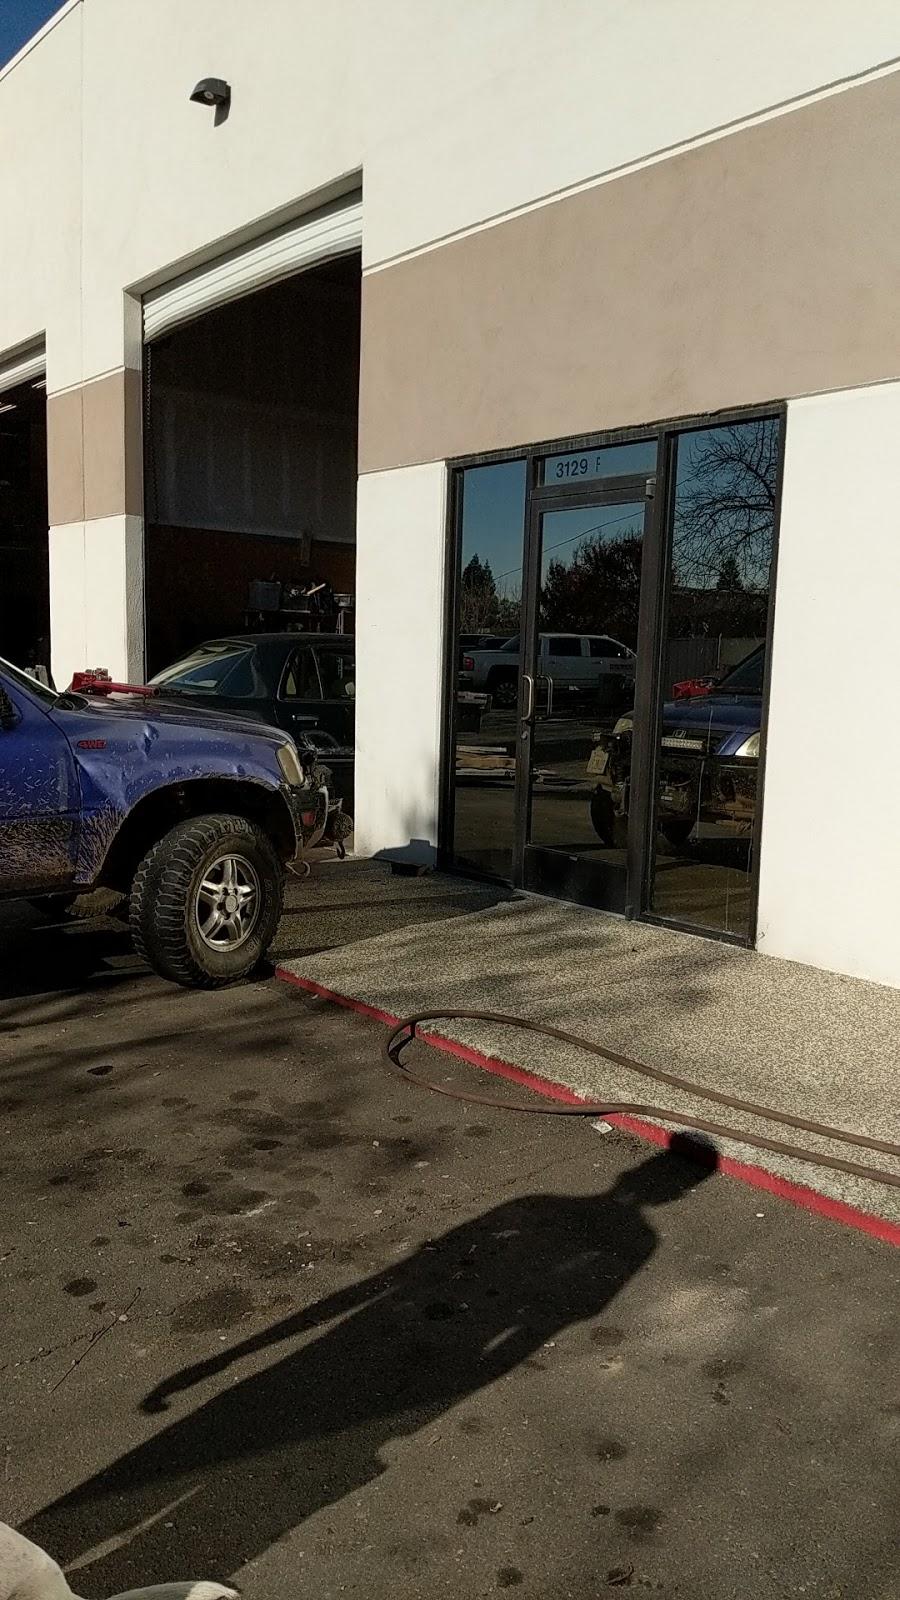 Old Time Restoration - car repair    Photo 1 of 4   Address: 3129 Swetzer Rd # F, Loomis, CA 95650, USA   Phone: (916) 303-0116